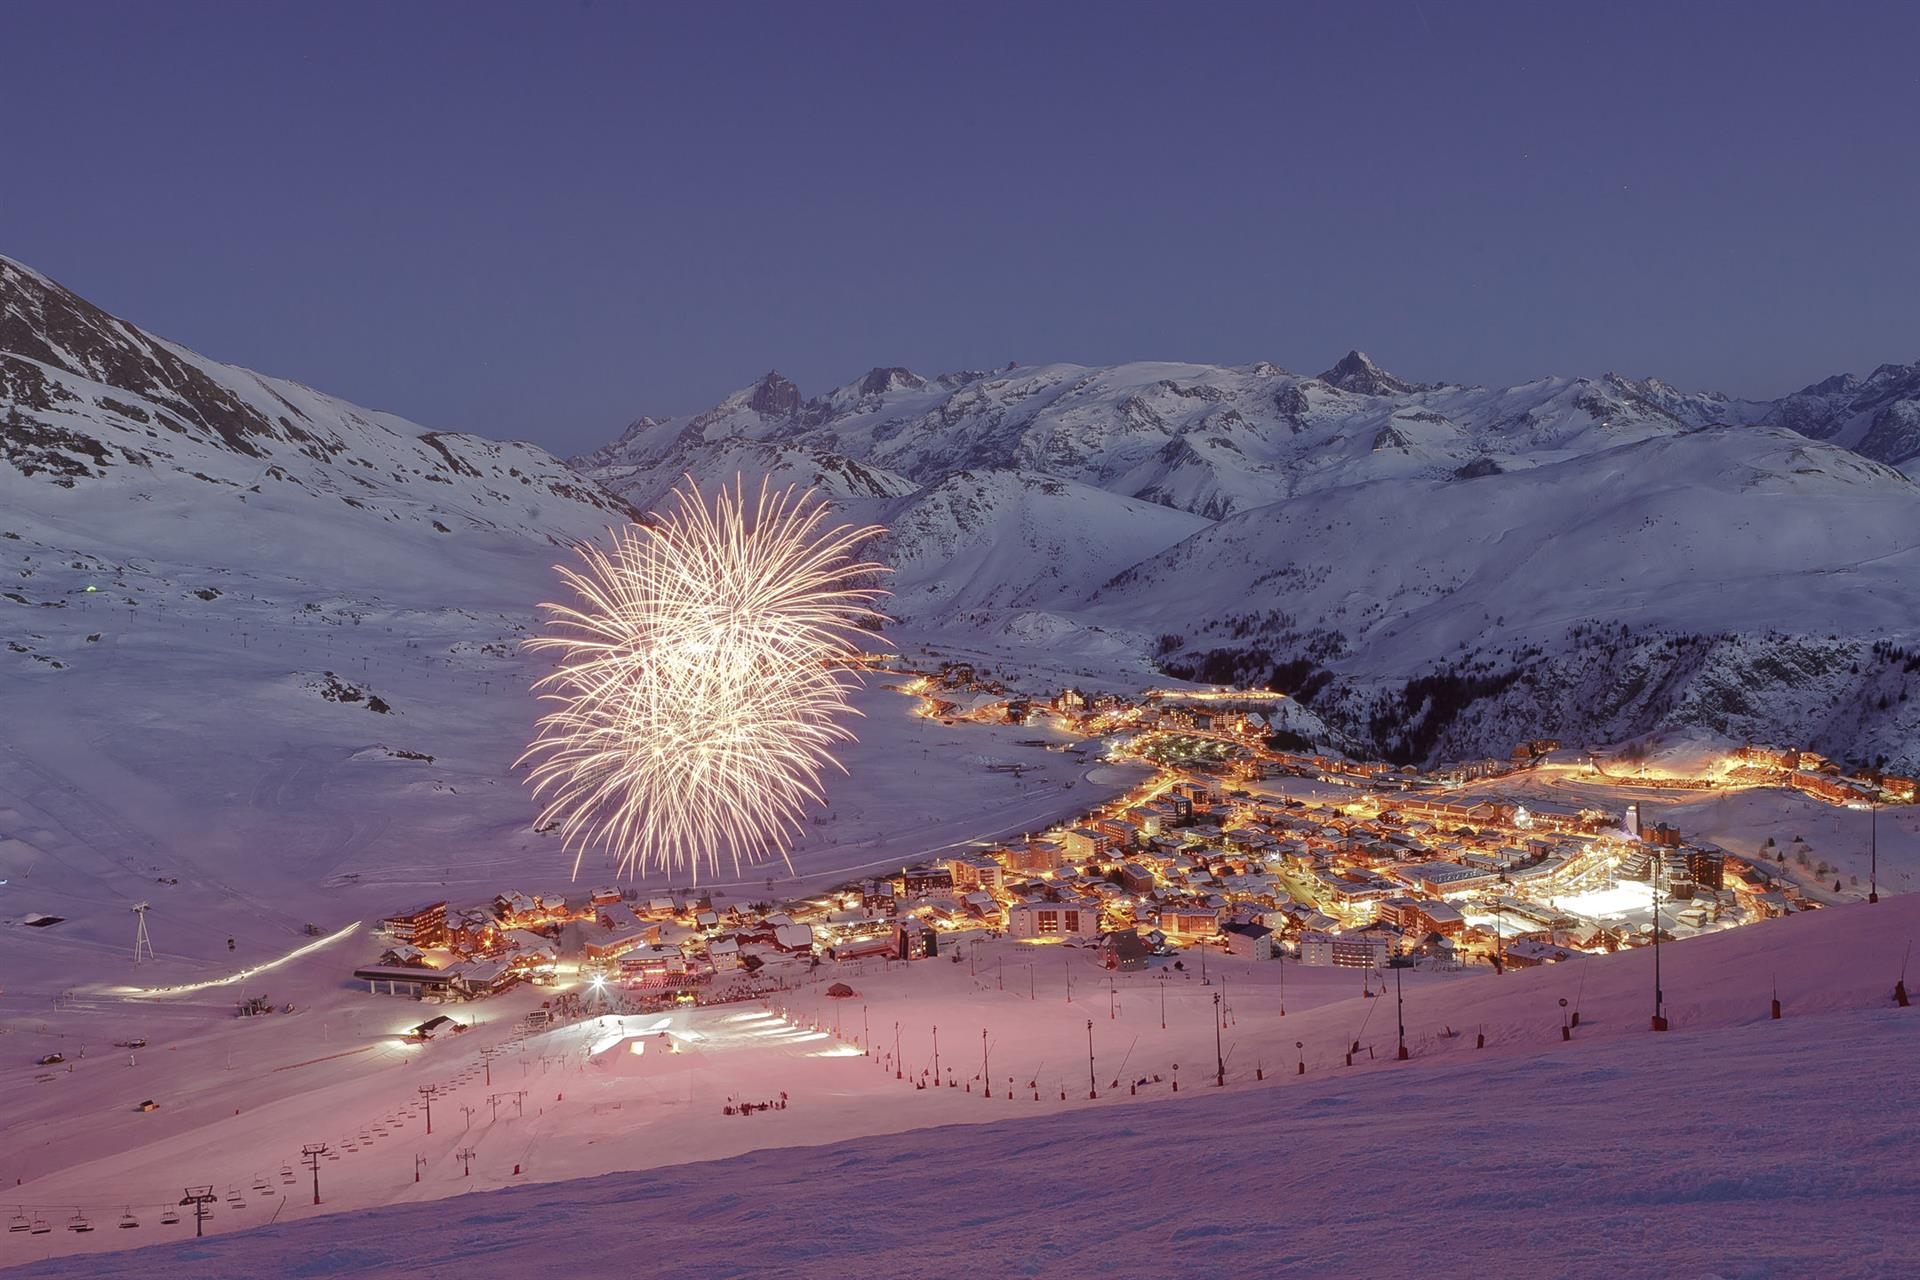 Resort Alpe d'Huez